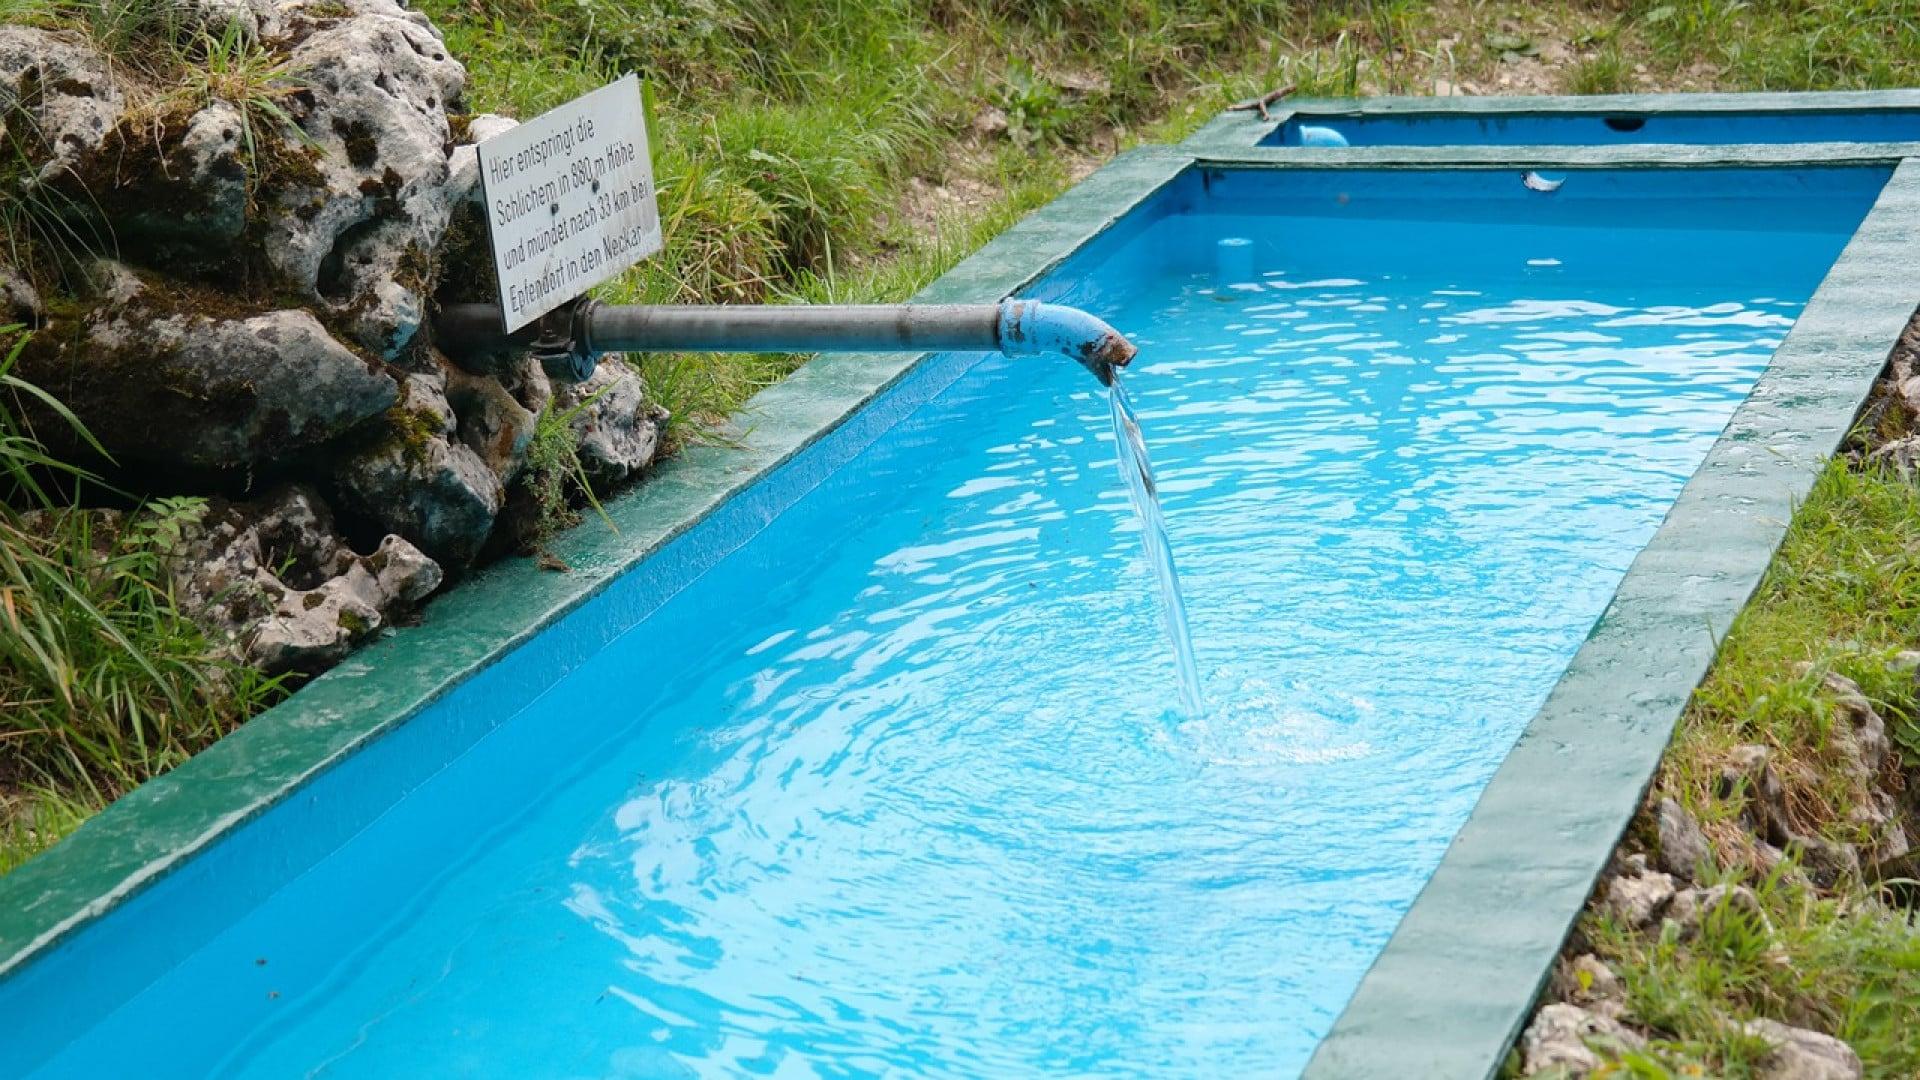 Adopter une piscine naturelle pour son jardin